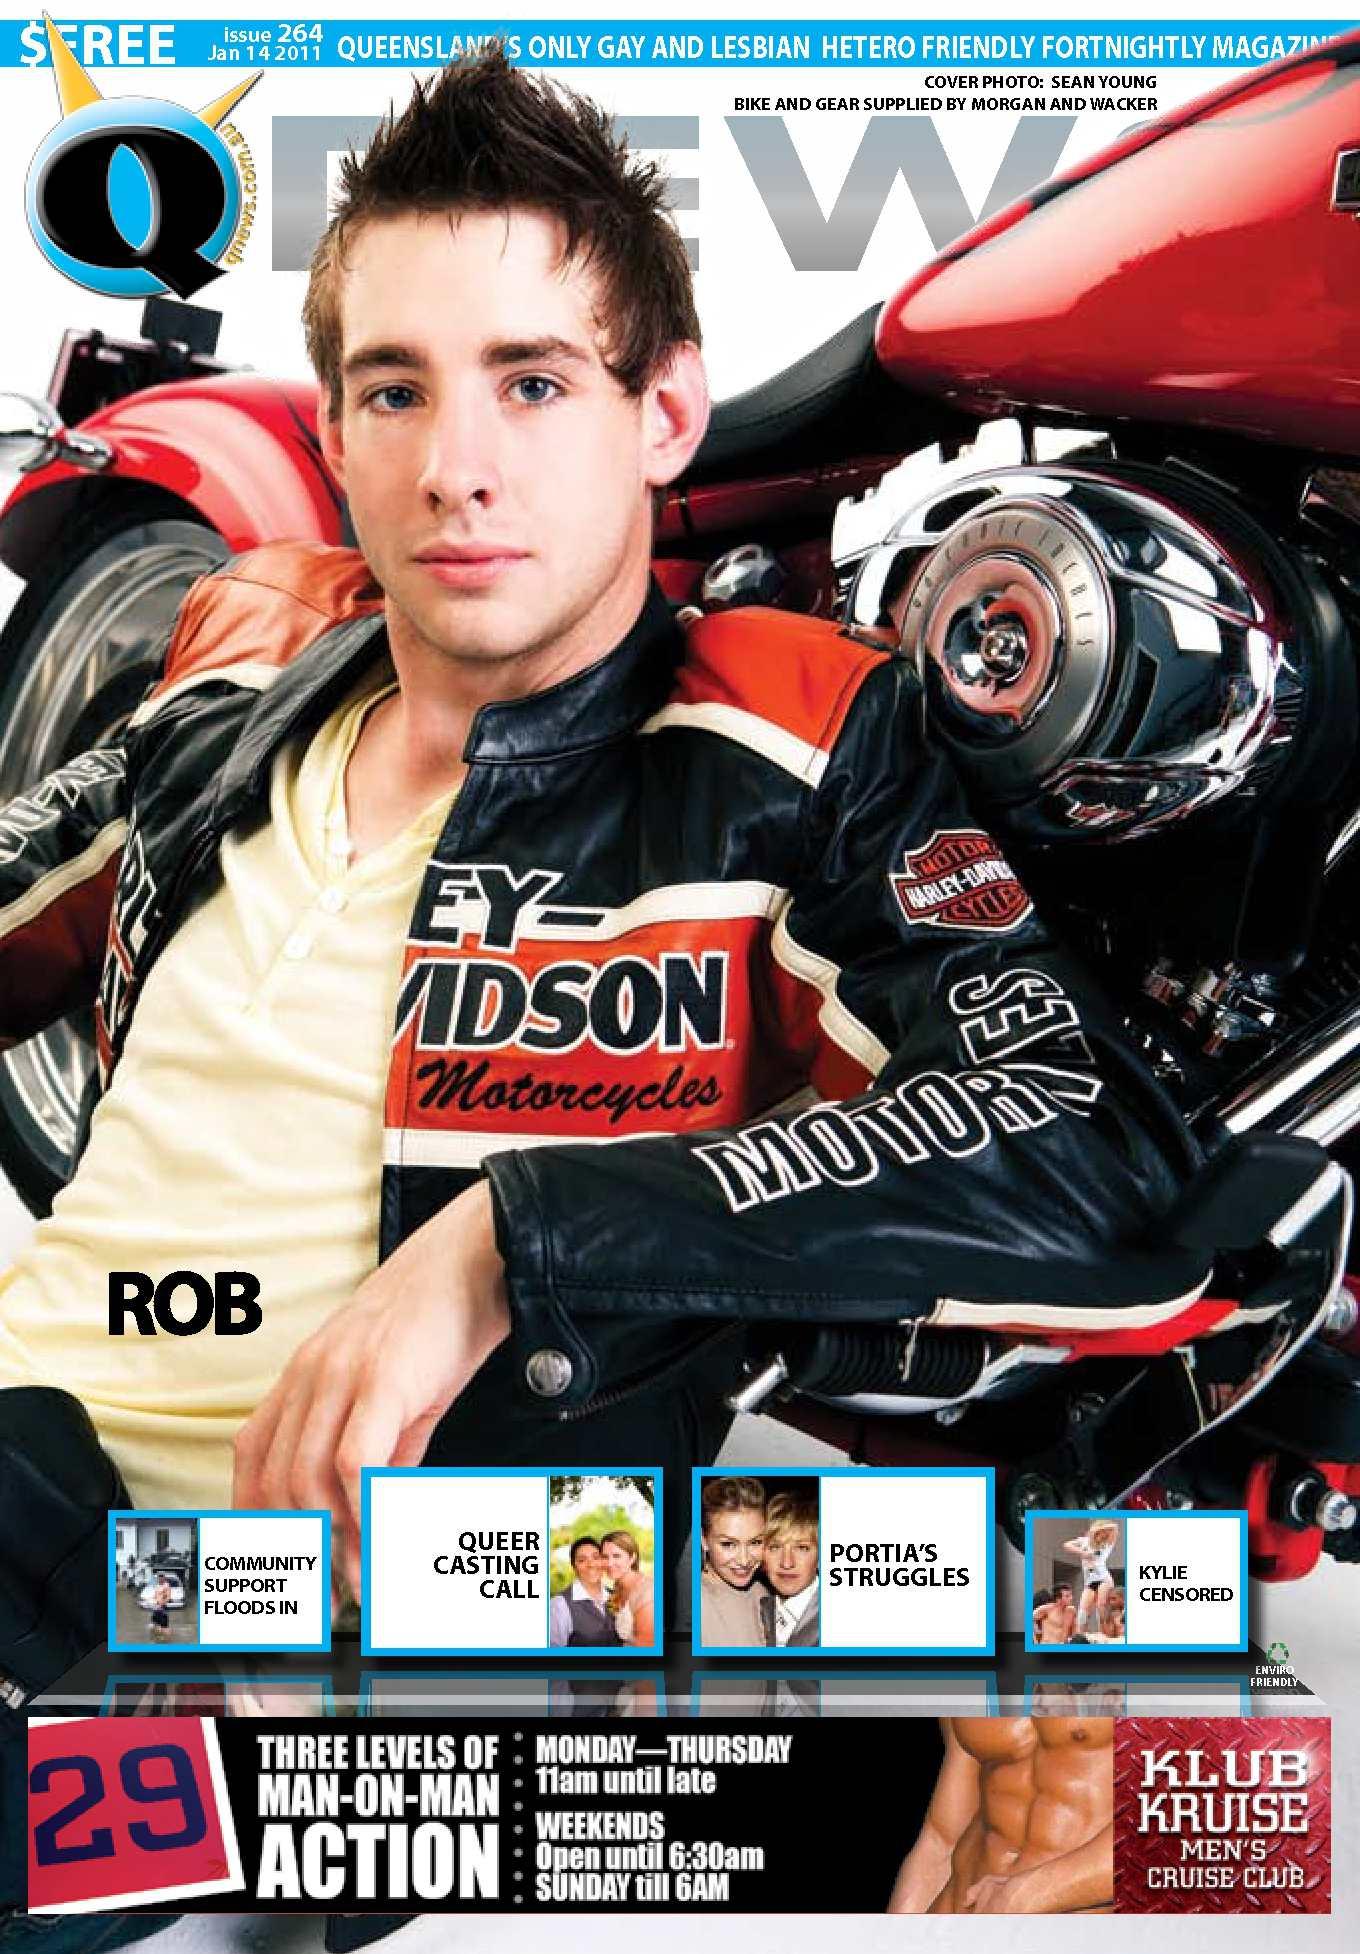 9a16e970ba Calaméo - QNews 264 Magazine Queensland s Gay and Lesbian Publication